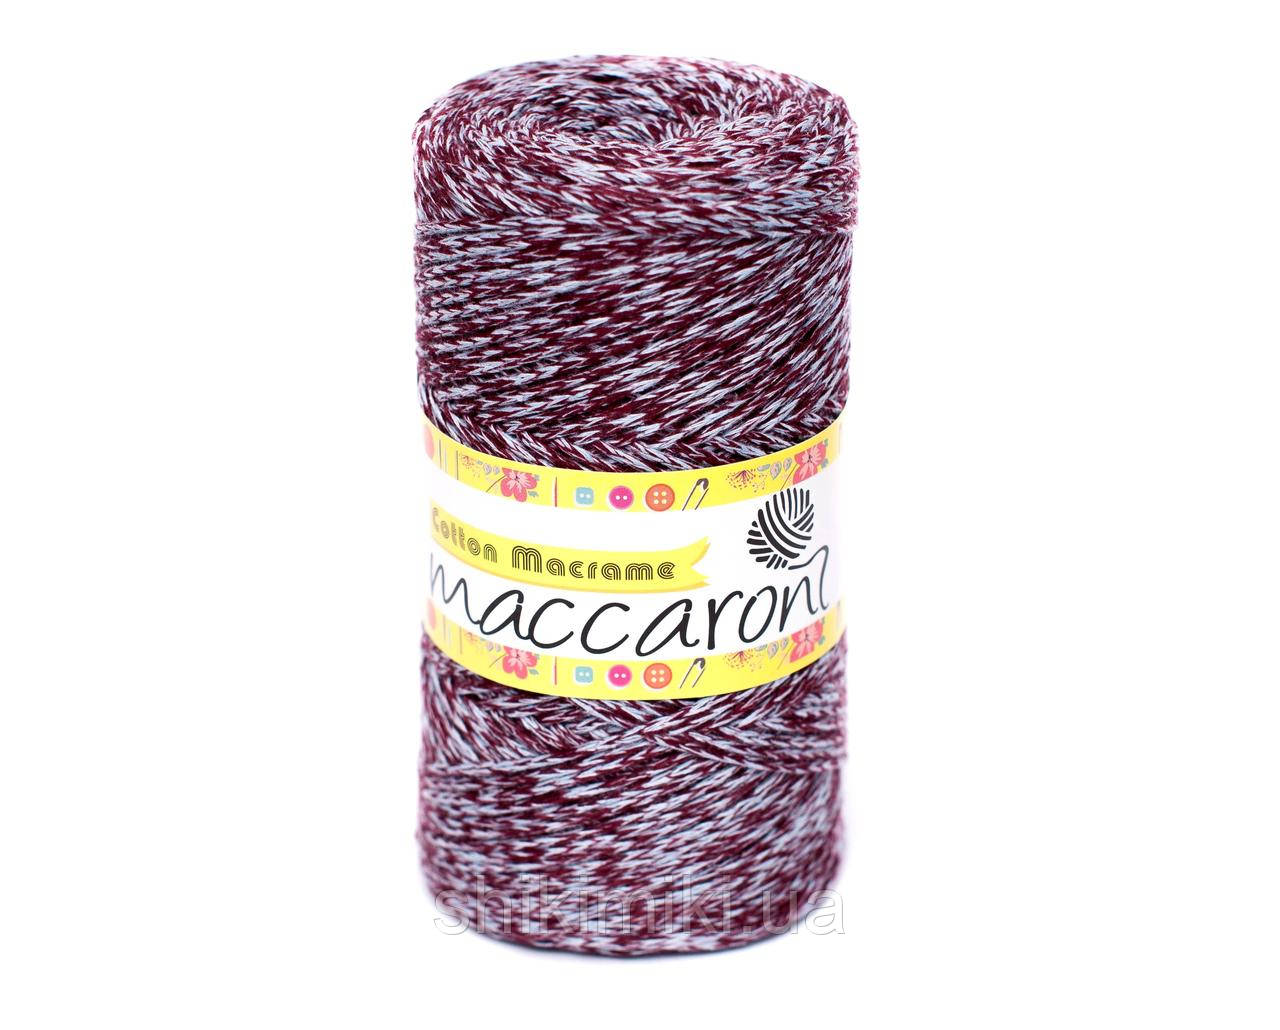 Эко Шнур Cotton Macrame, цвет Бордово-серый